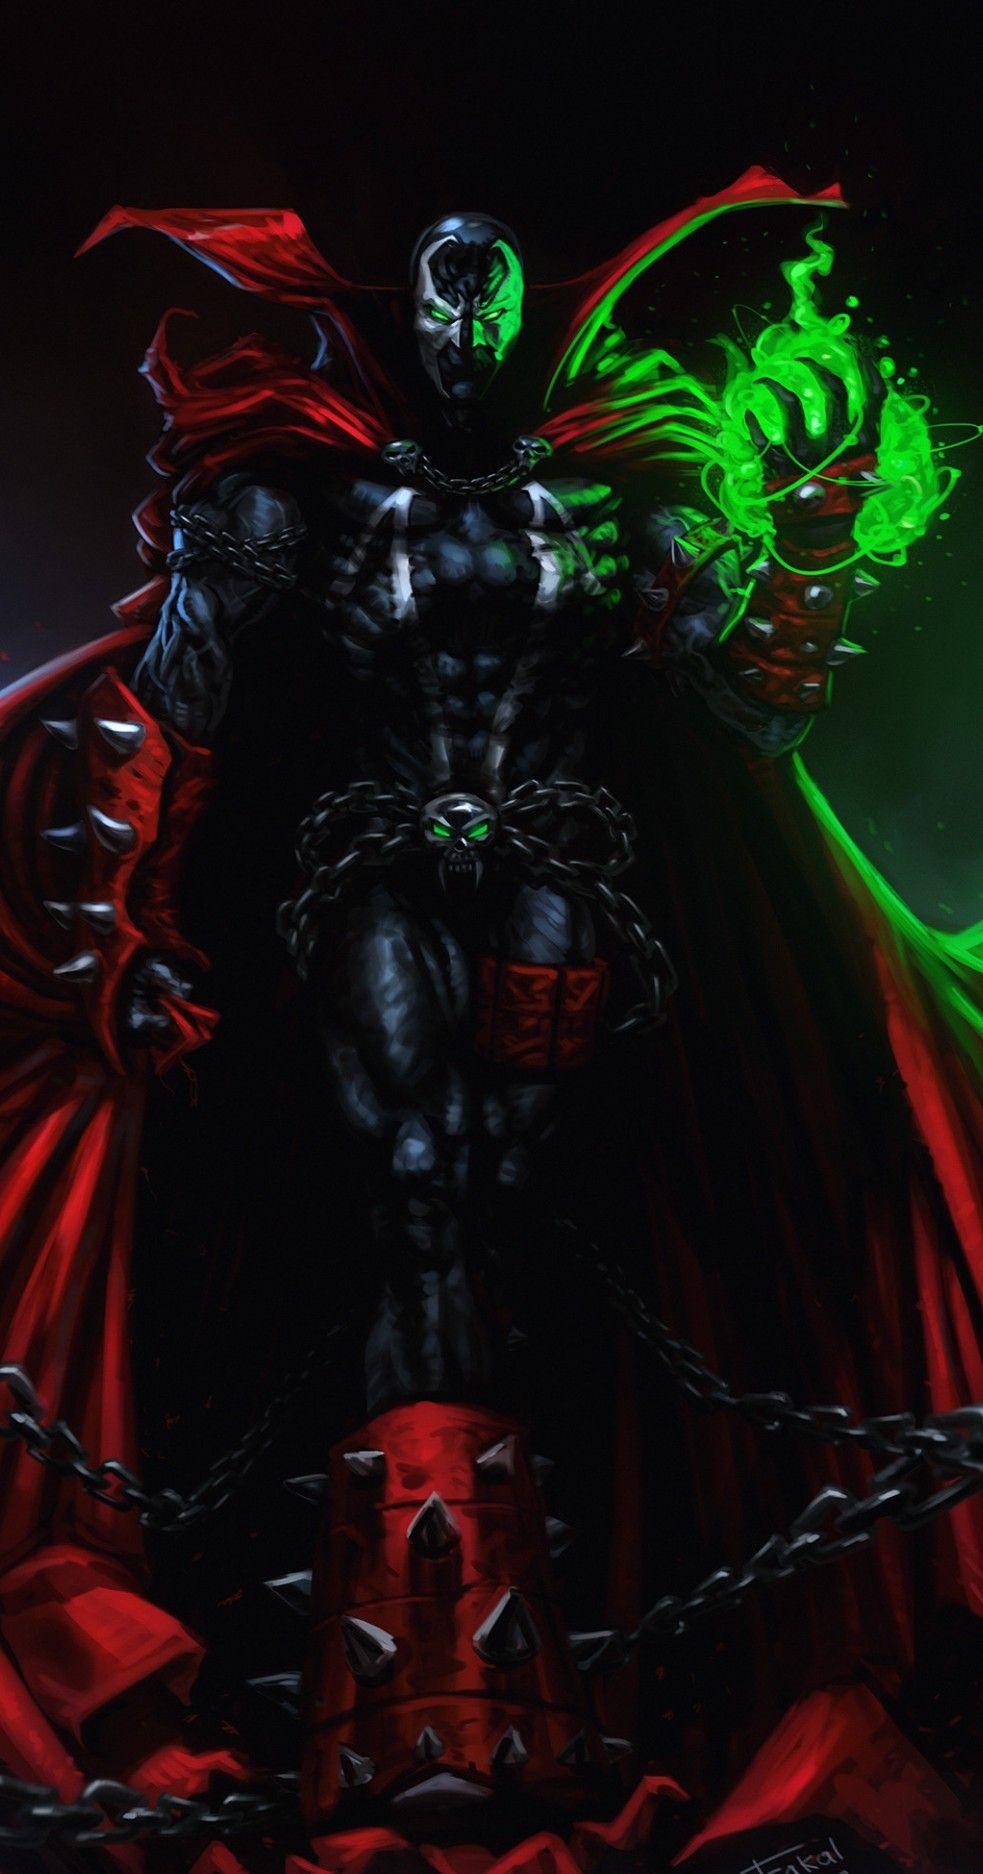 Pin By Marisa Villarreal On Spawn Spawn Comics Marvel Superhero Posters Spawn